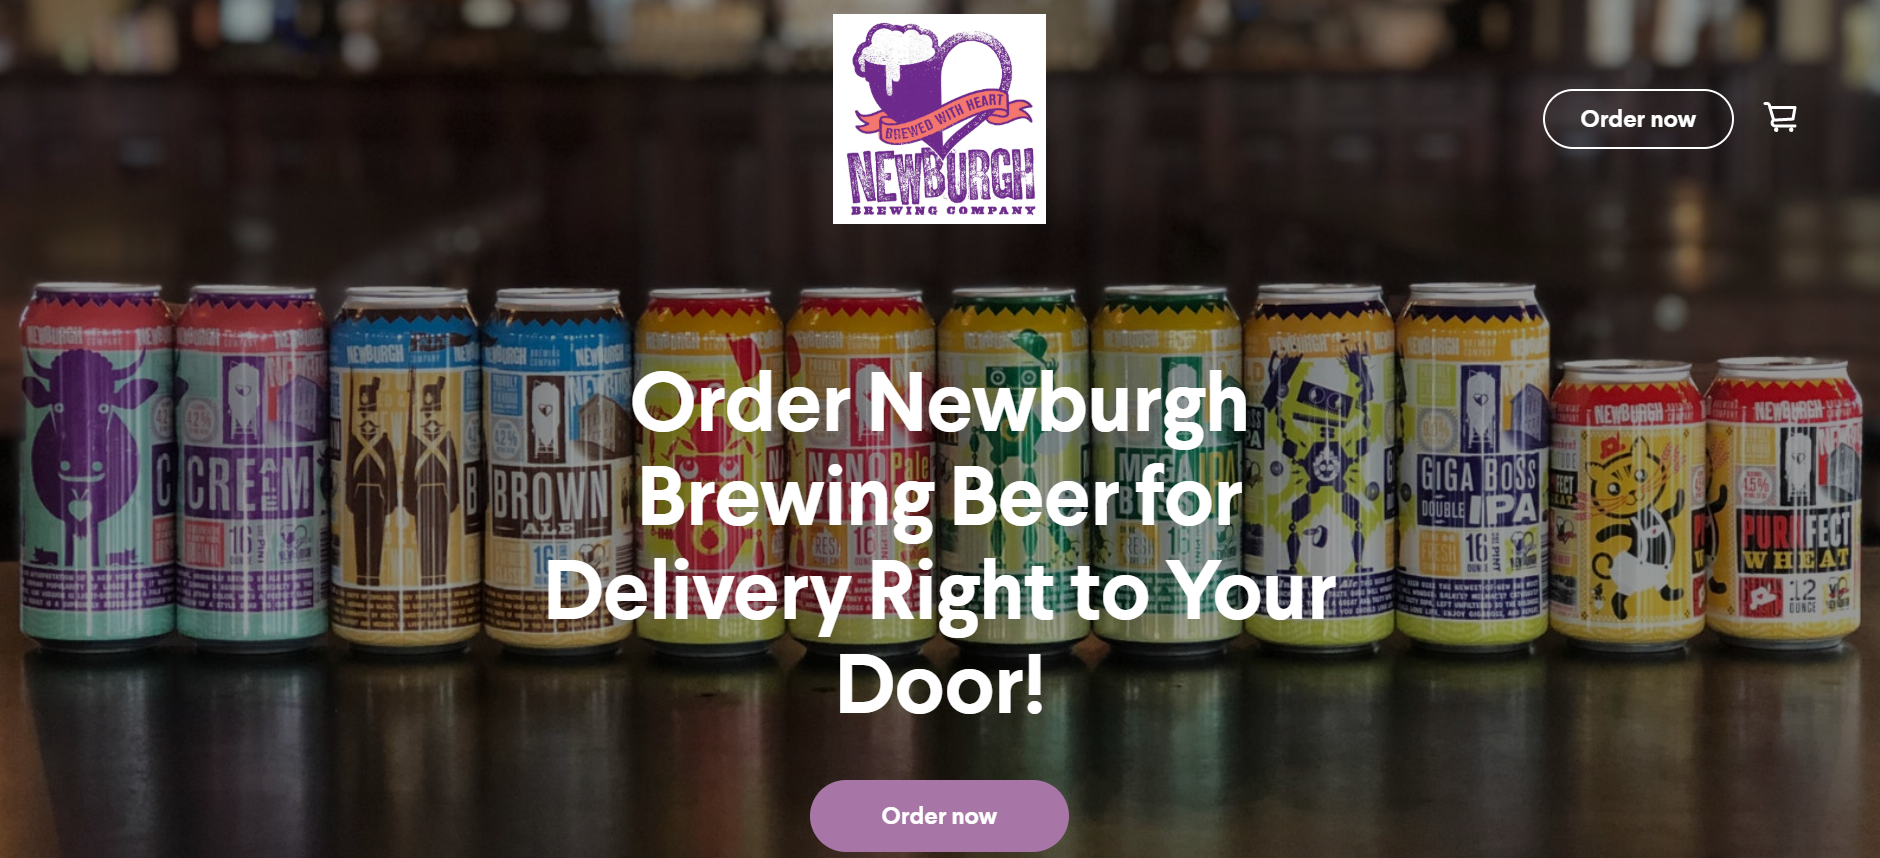 Newburgh Brewing Company Newburgh New York